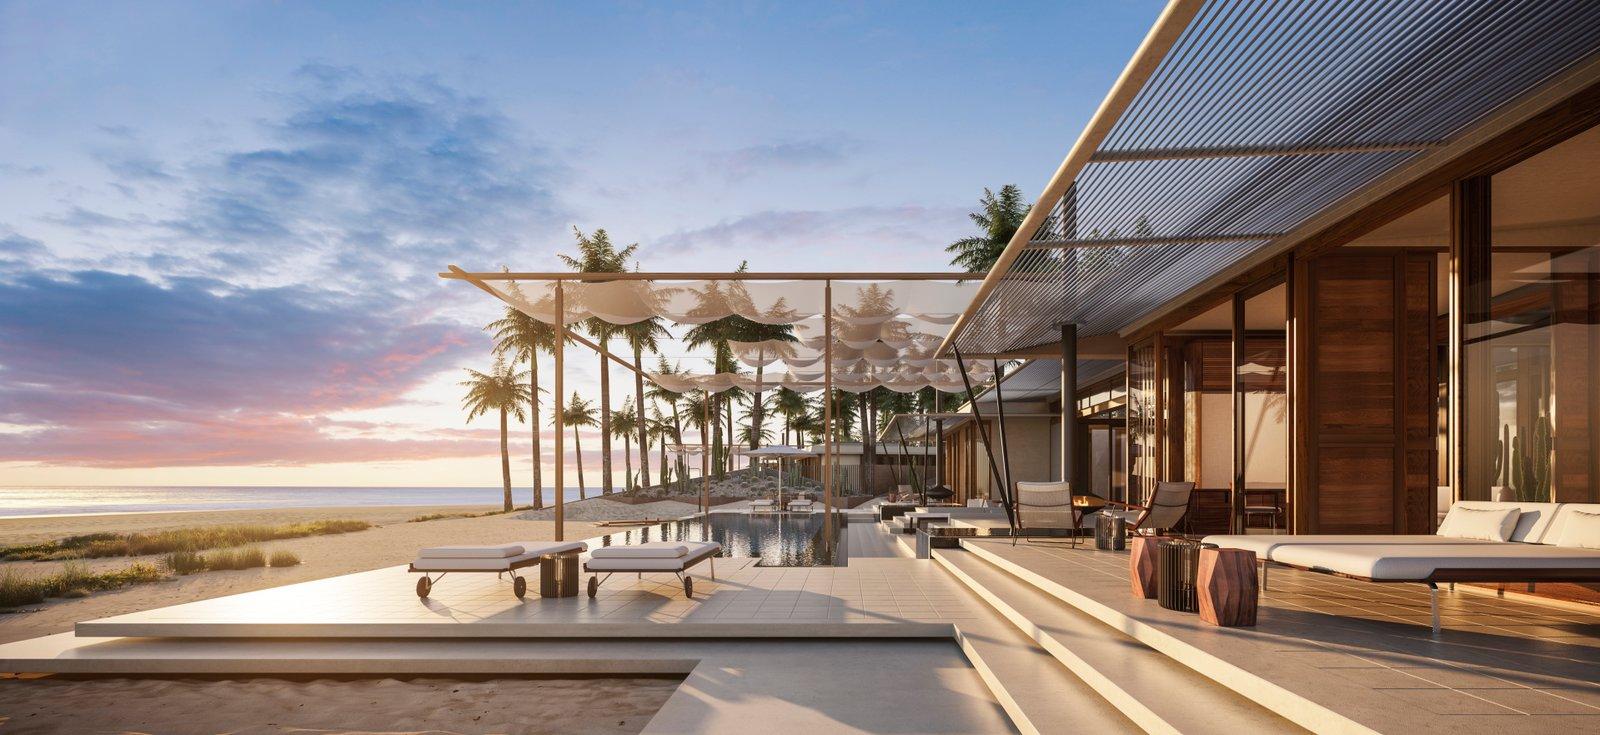 An Extraordinary Resort on the Baja Peninsula Modern Home